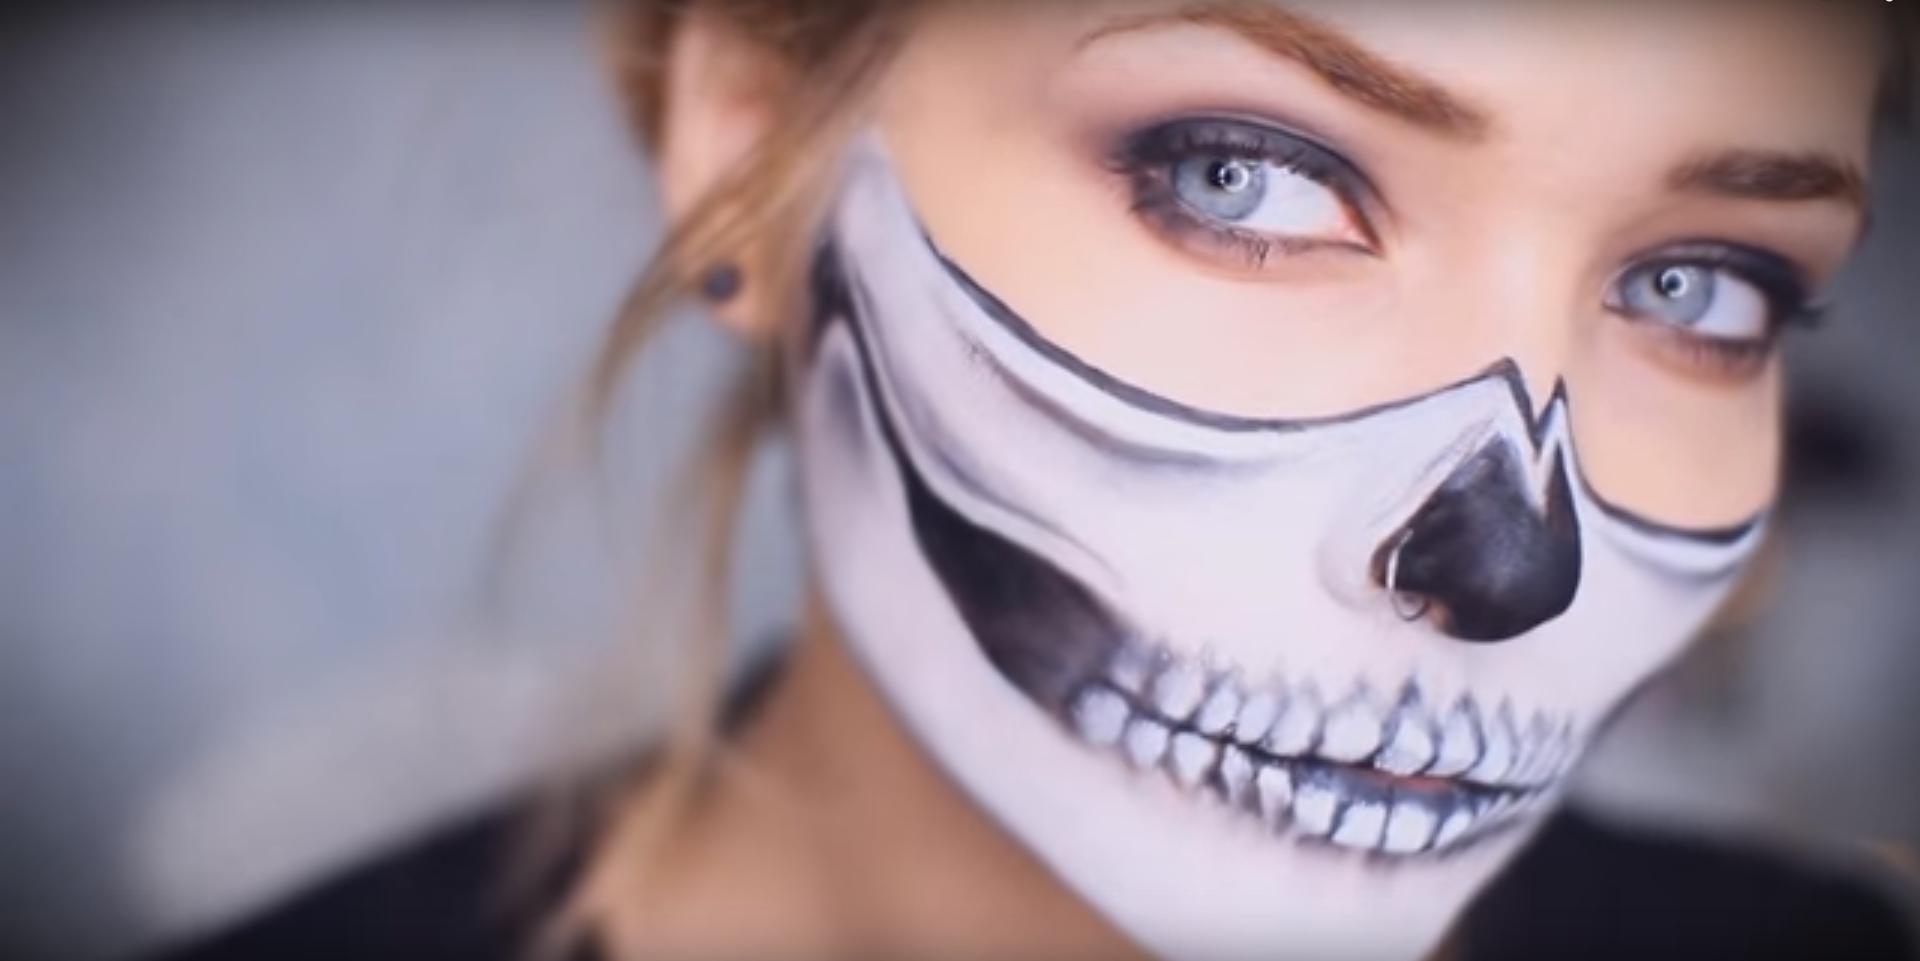 Cheap (and Creative) Halloween Makeup Tutorial RTM - Cheap Halloween Makeup